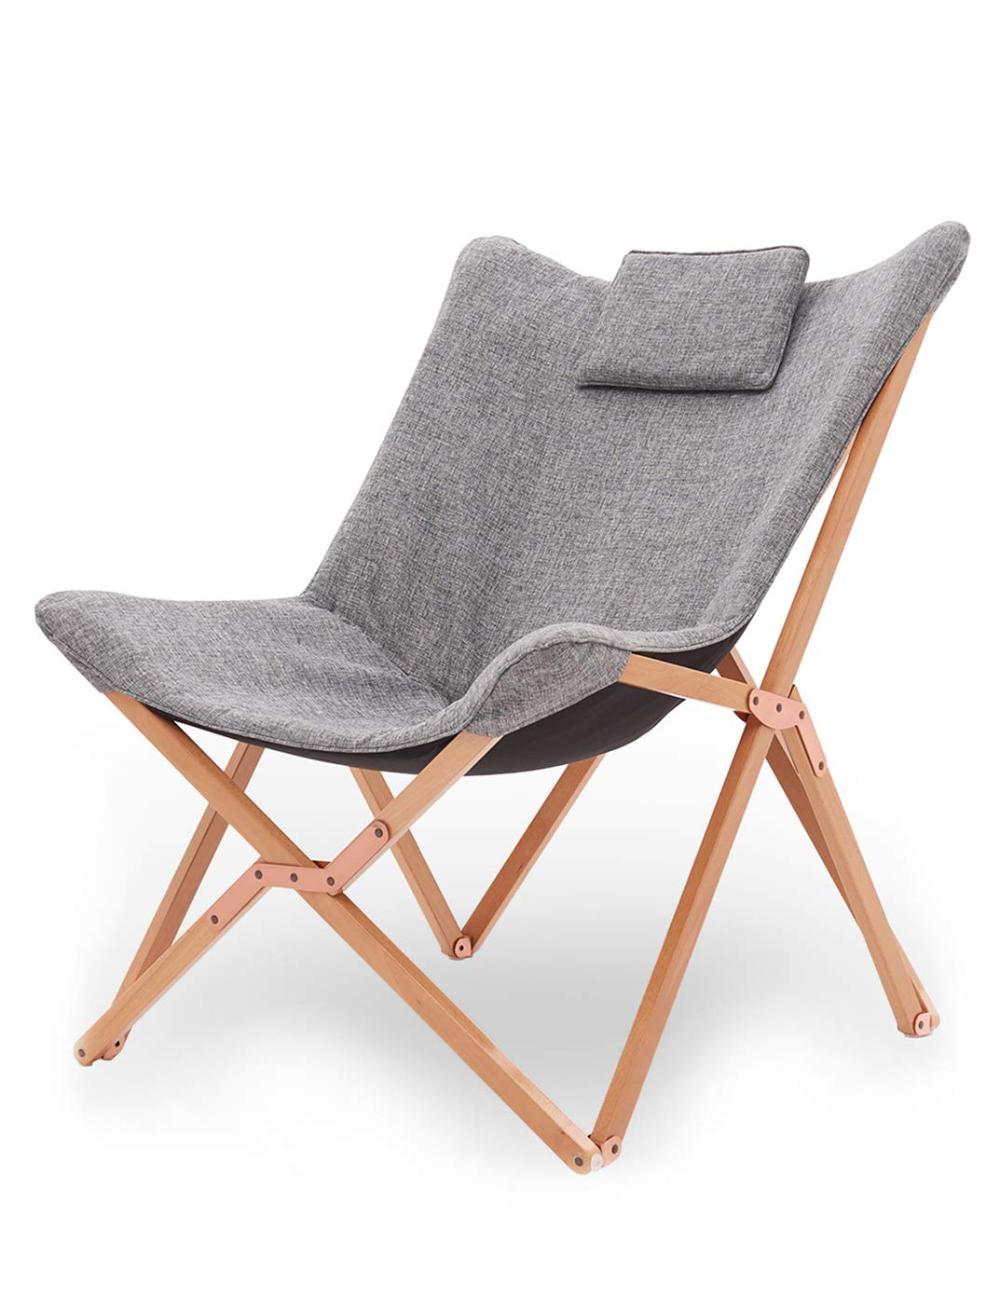 Suhu Klappstuhl Camping Stuhl Lounge Sessel Modern Design Retro